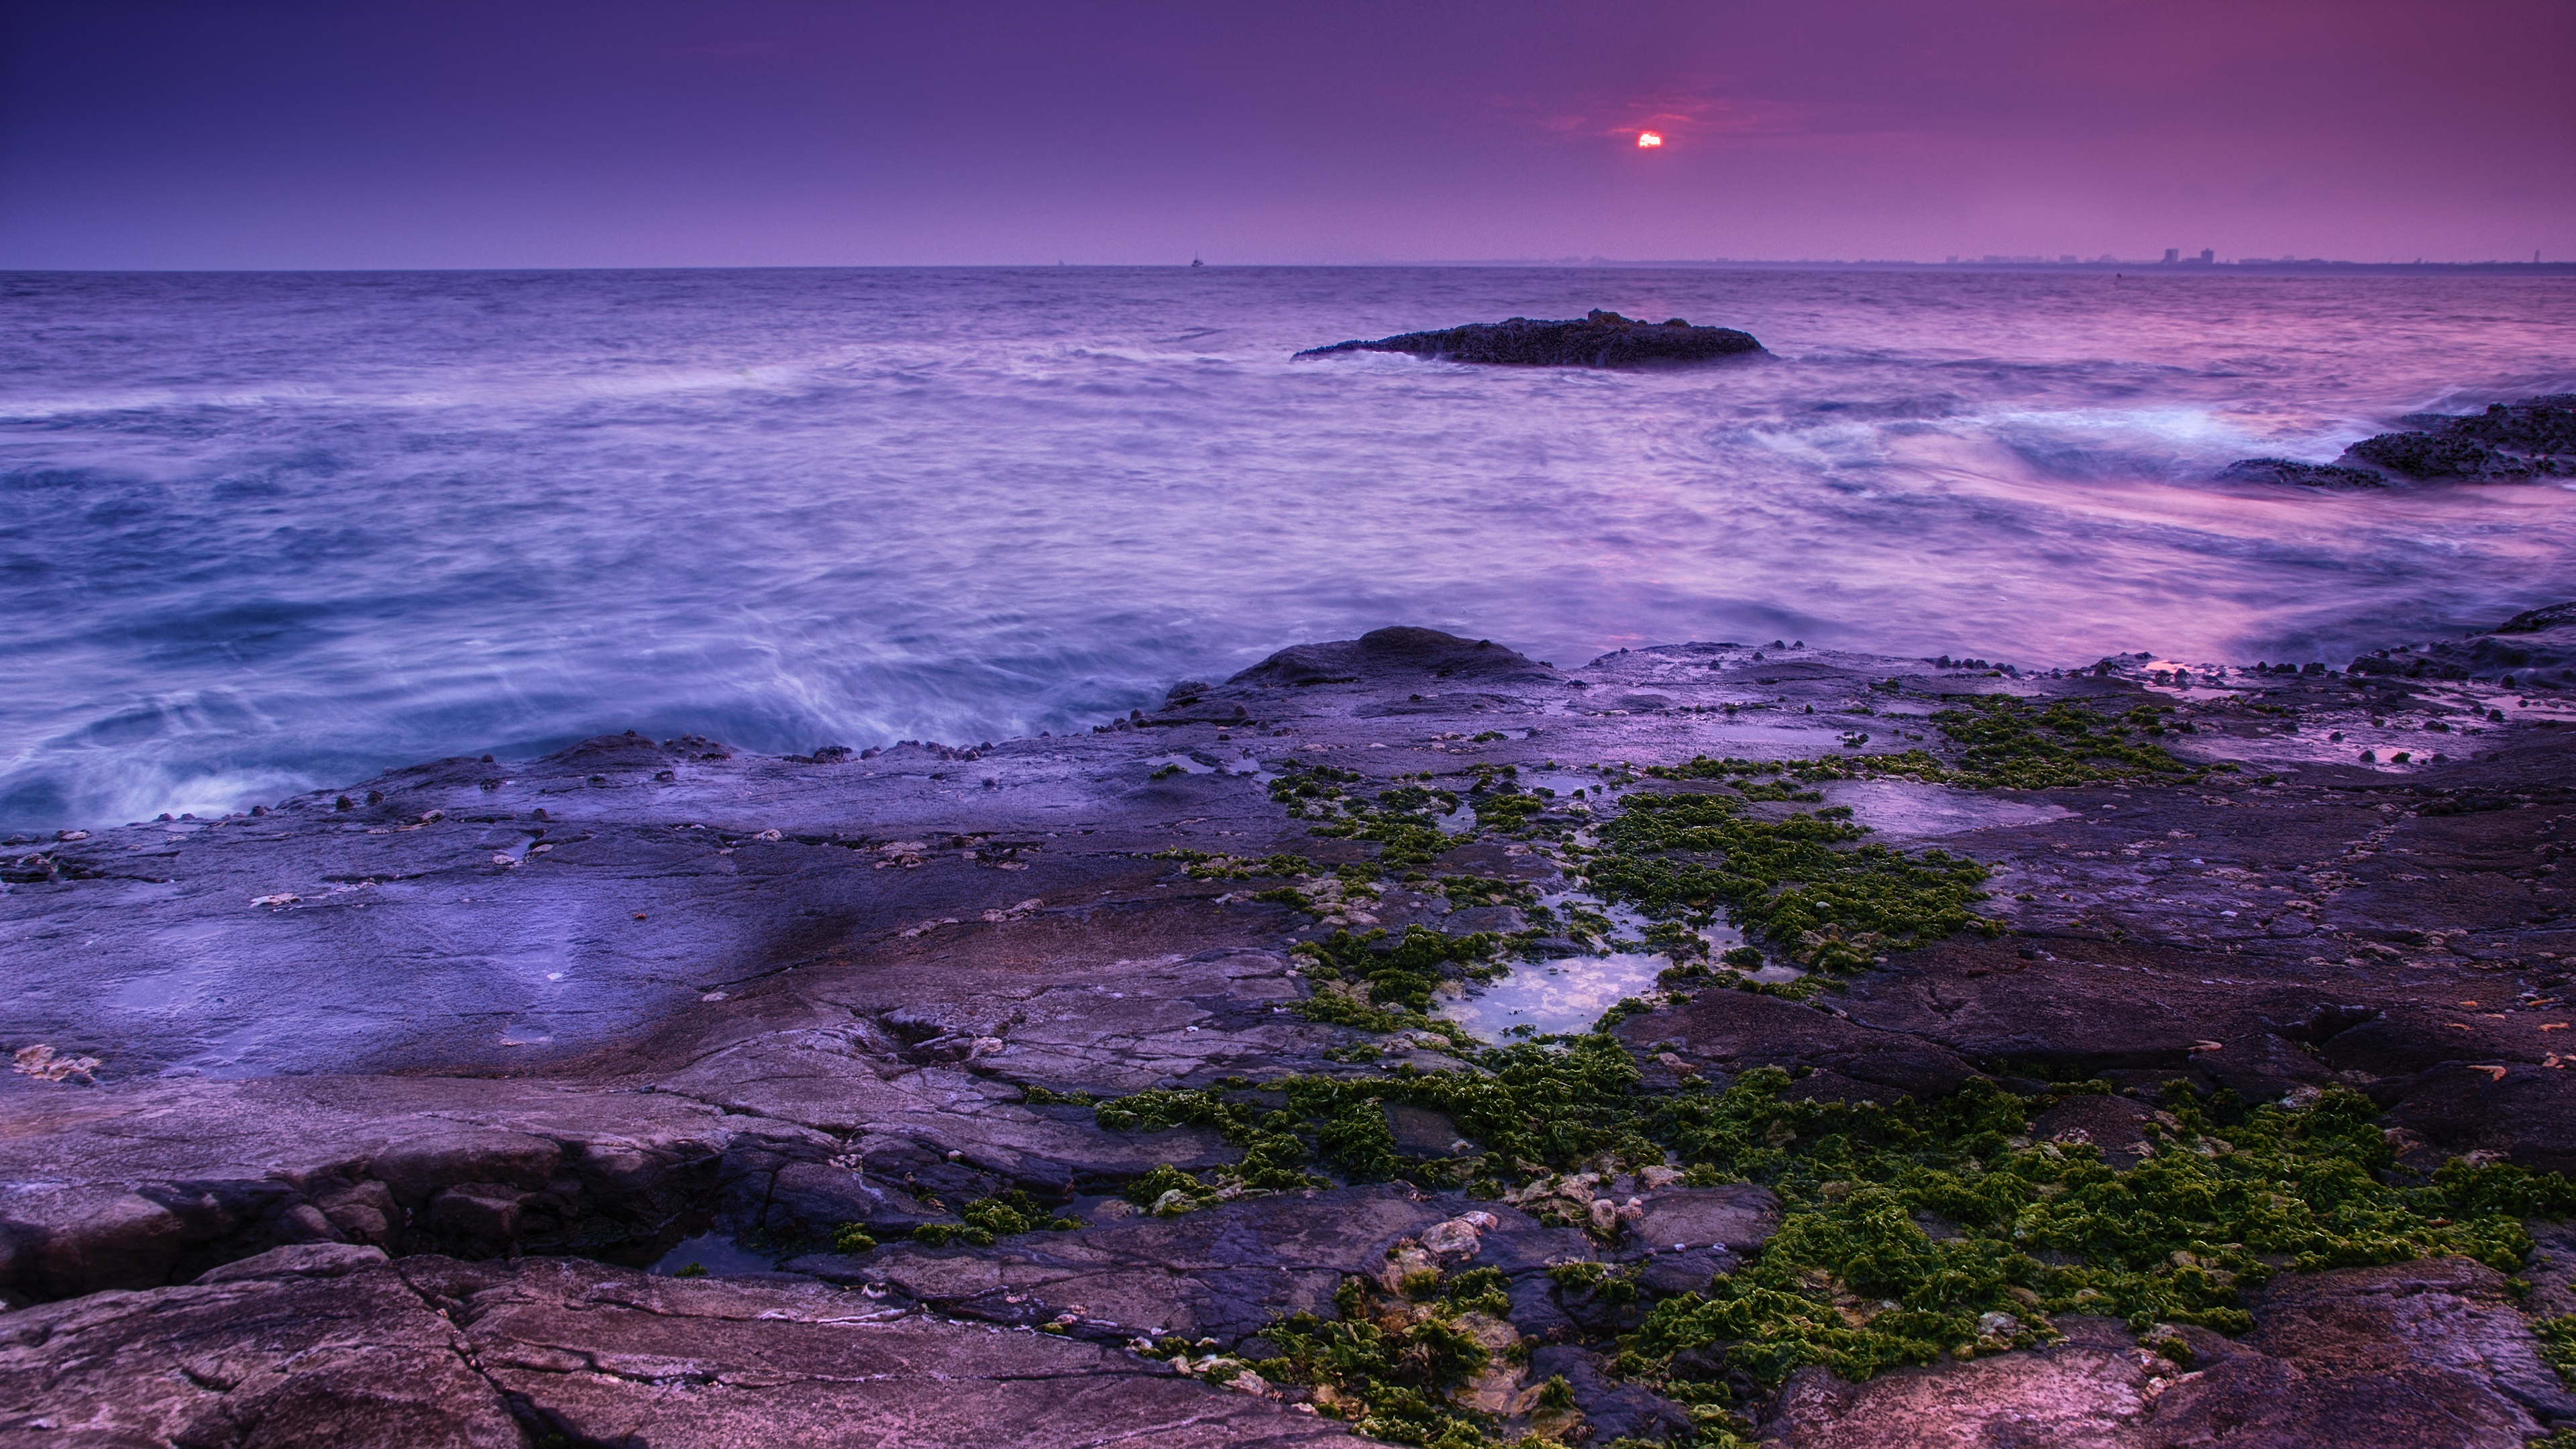 Purple seascape from Enoshima wallpaper